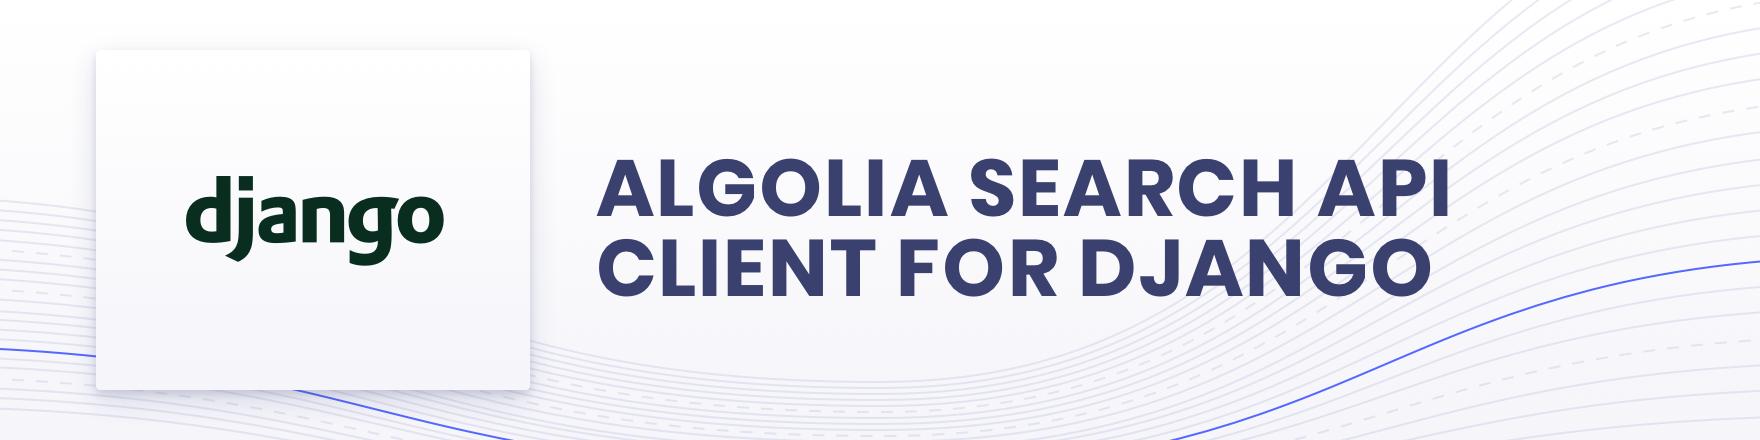 Algolia for Django